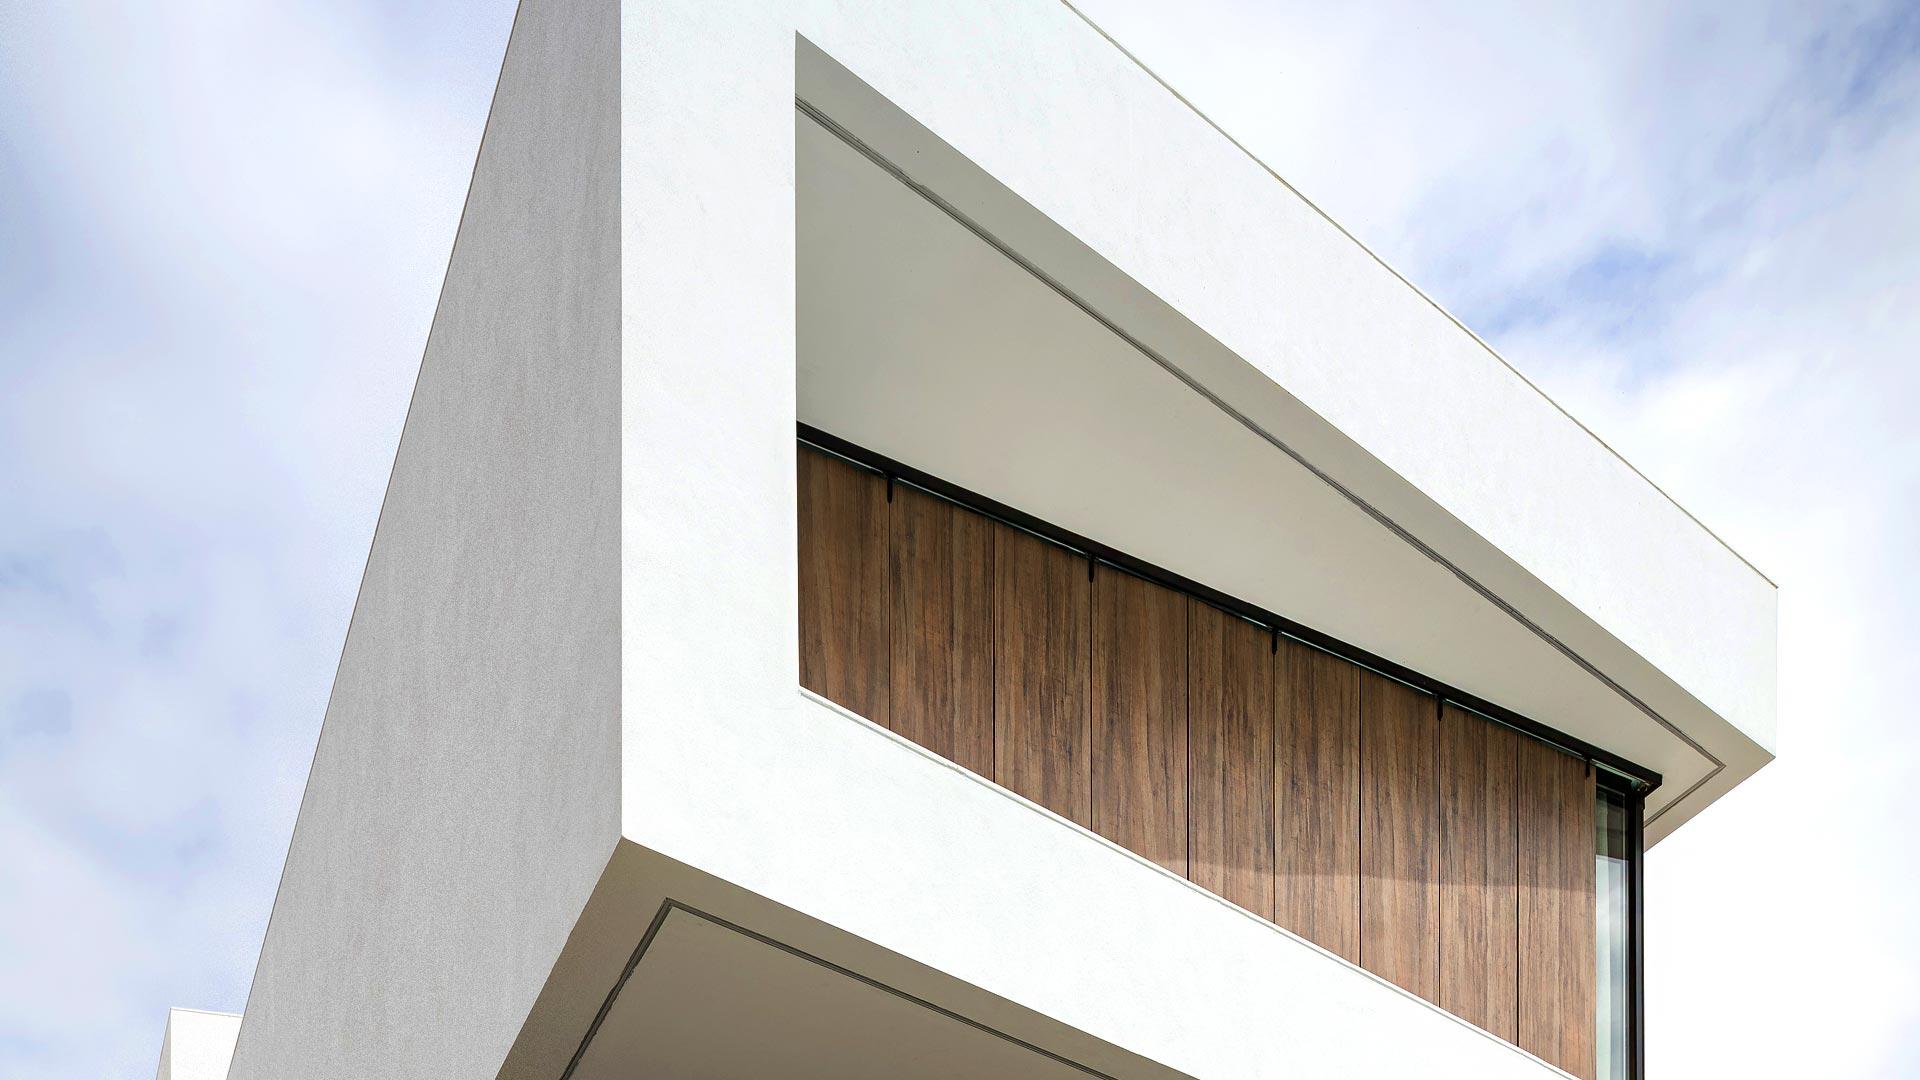 J03 Arquitectura Córdoba - Complot Arquitectos en Córdoba